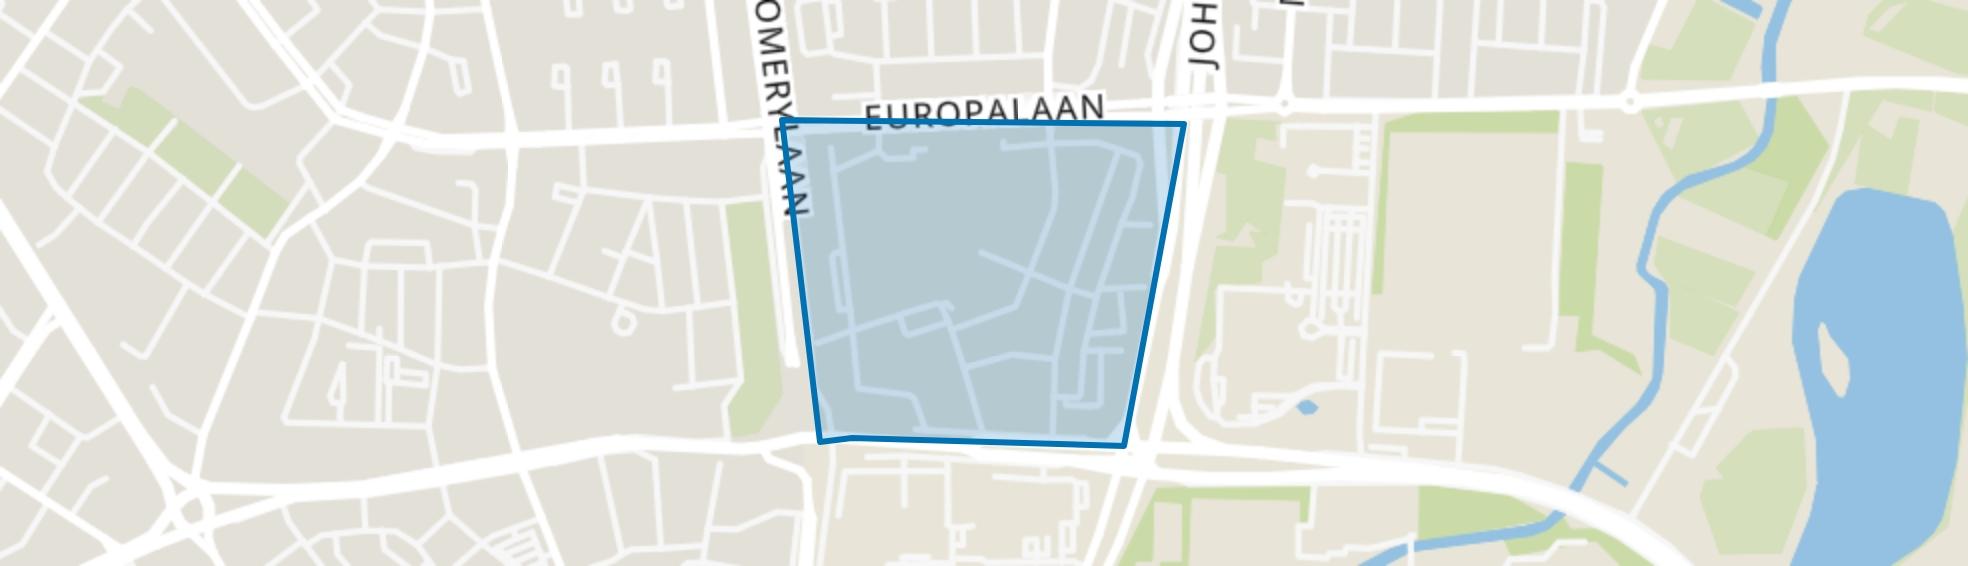 Oude Toren, Eindhoven map